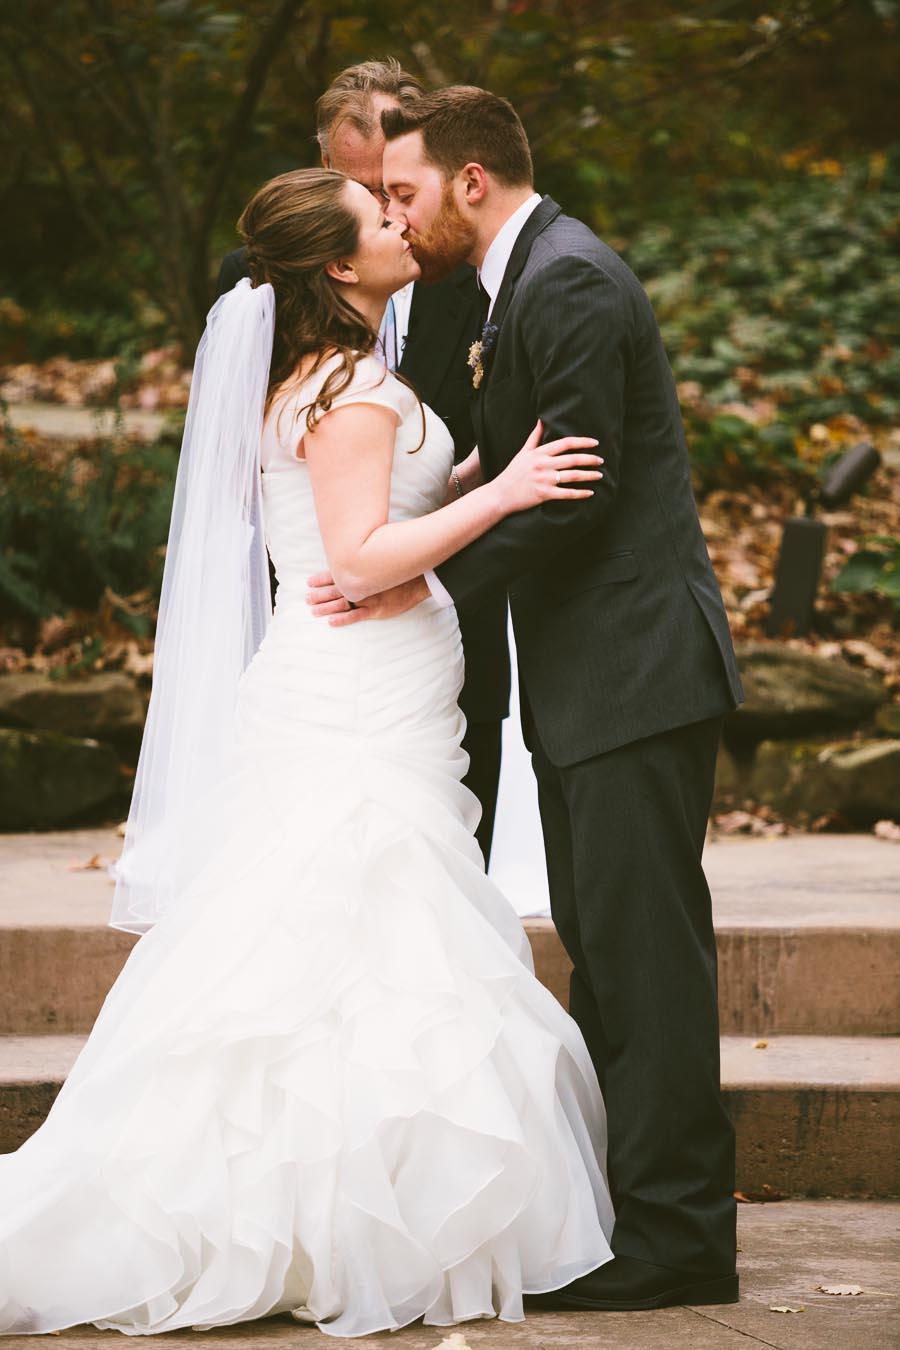 landolls-mohican-castle-wedding-photography-49.jpg